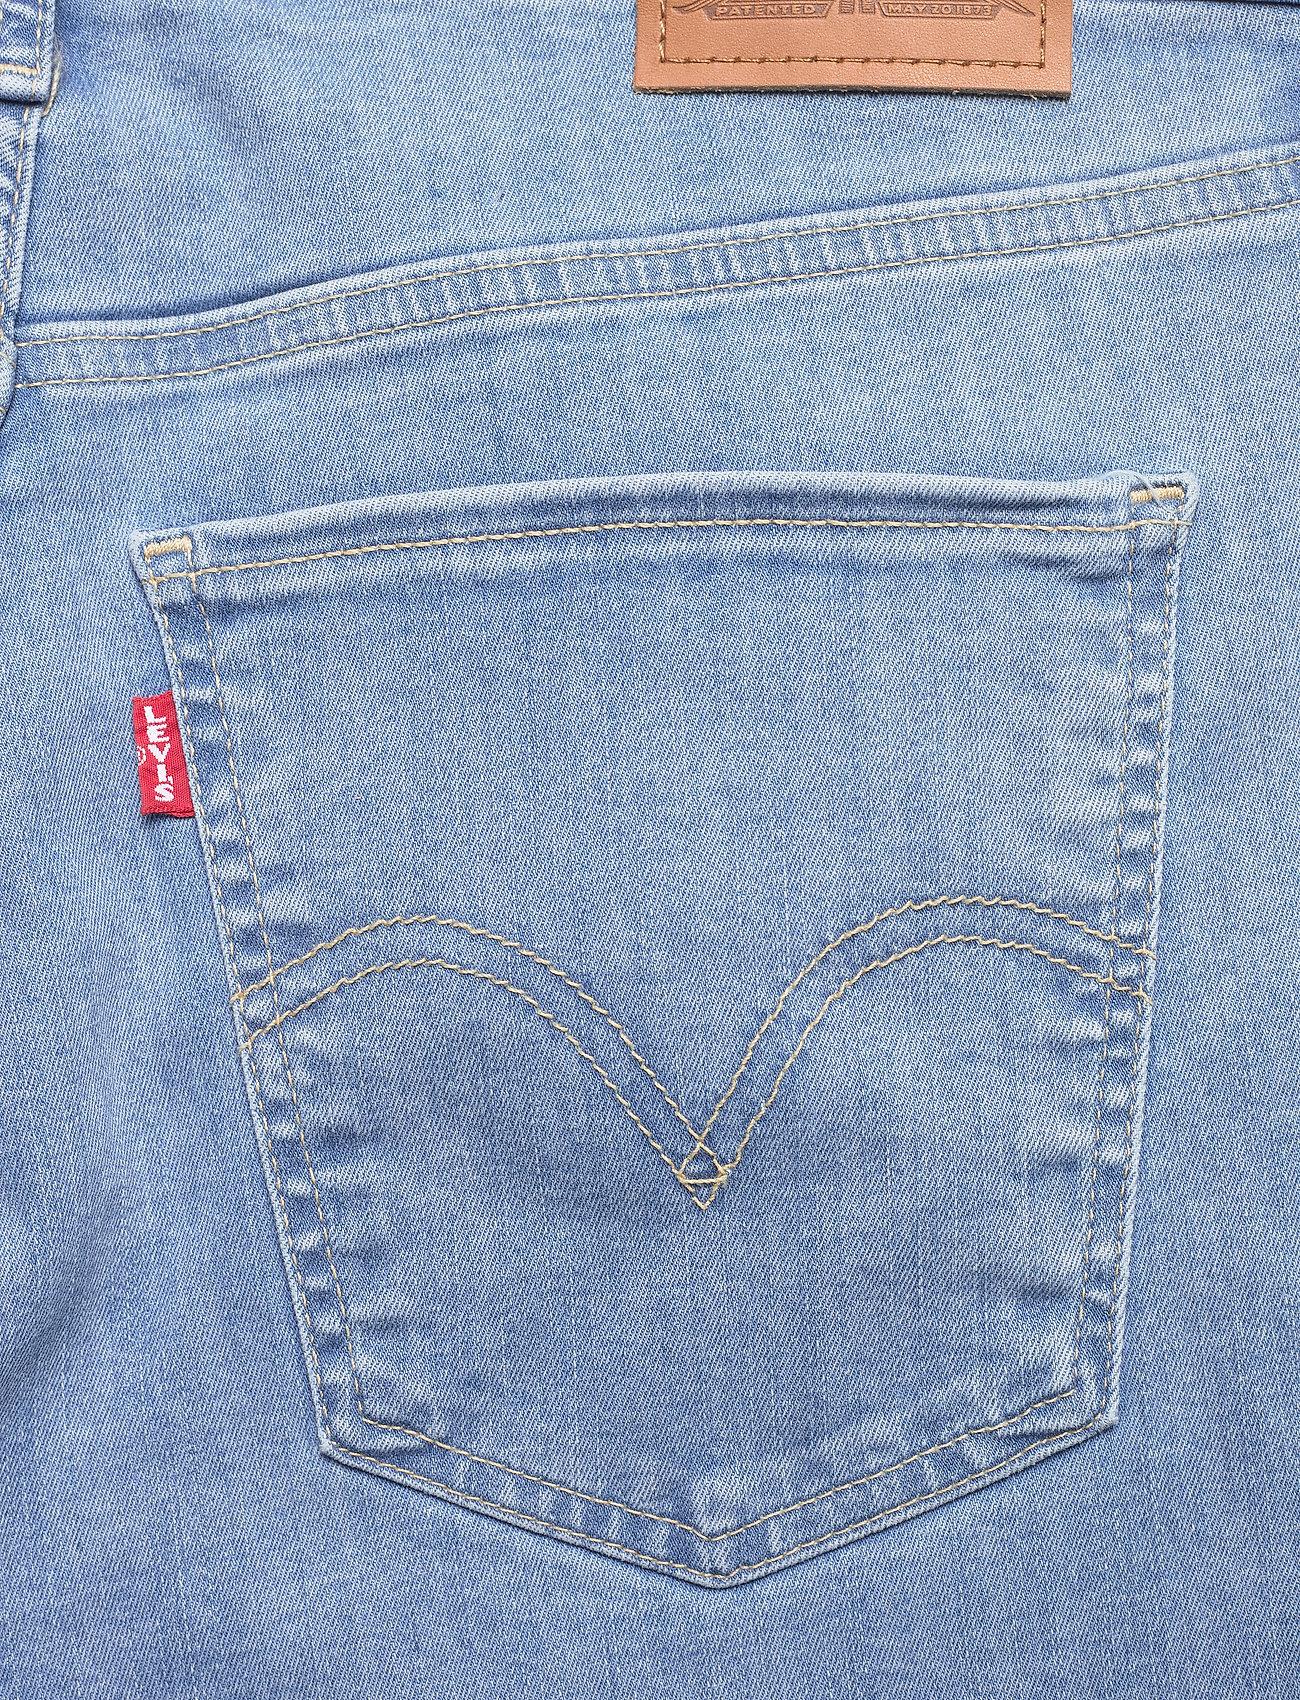 Levi's Plus Size - PLUS MILE HIGH SS GALAXY HAZY - skinny jeans - med indigo - worn in - 4